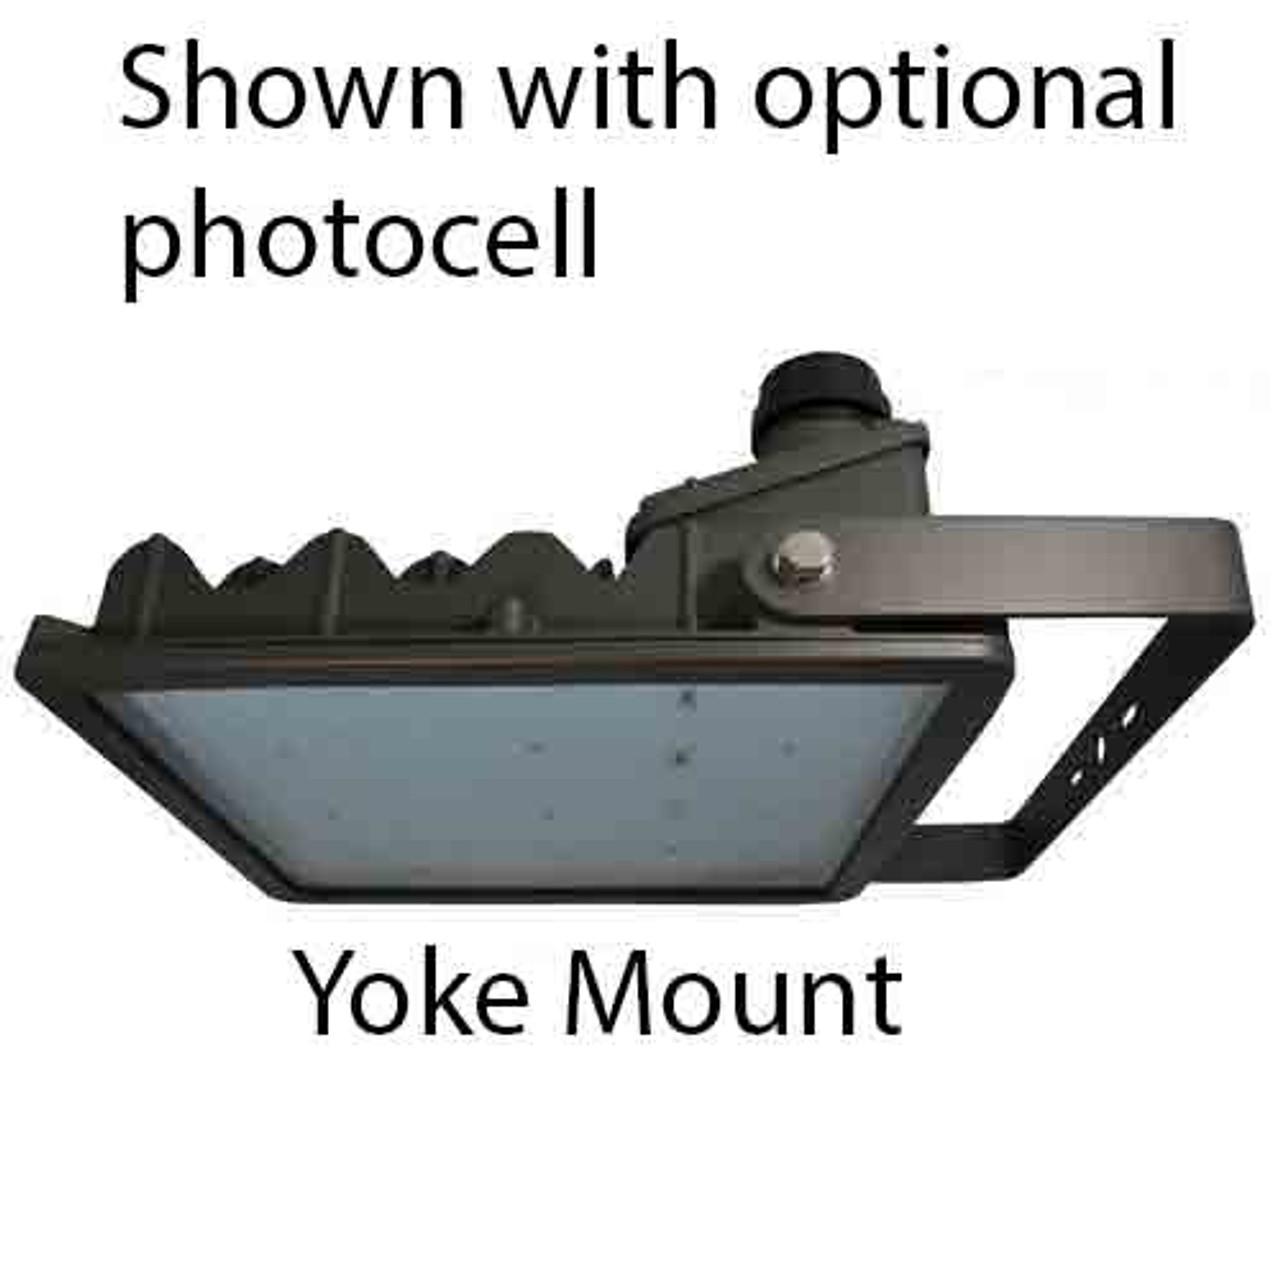 262 Watt LED Area Light 26,264 Lumens with yoke mount